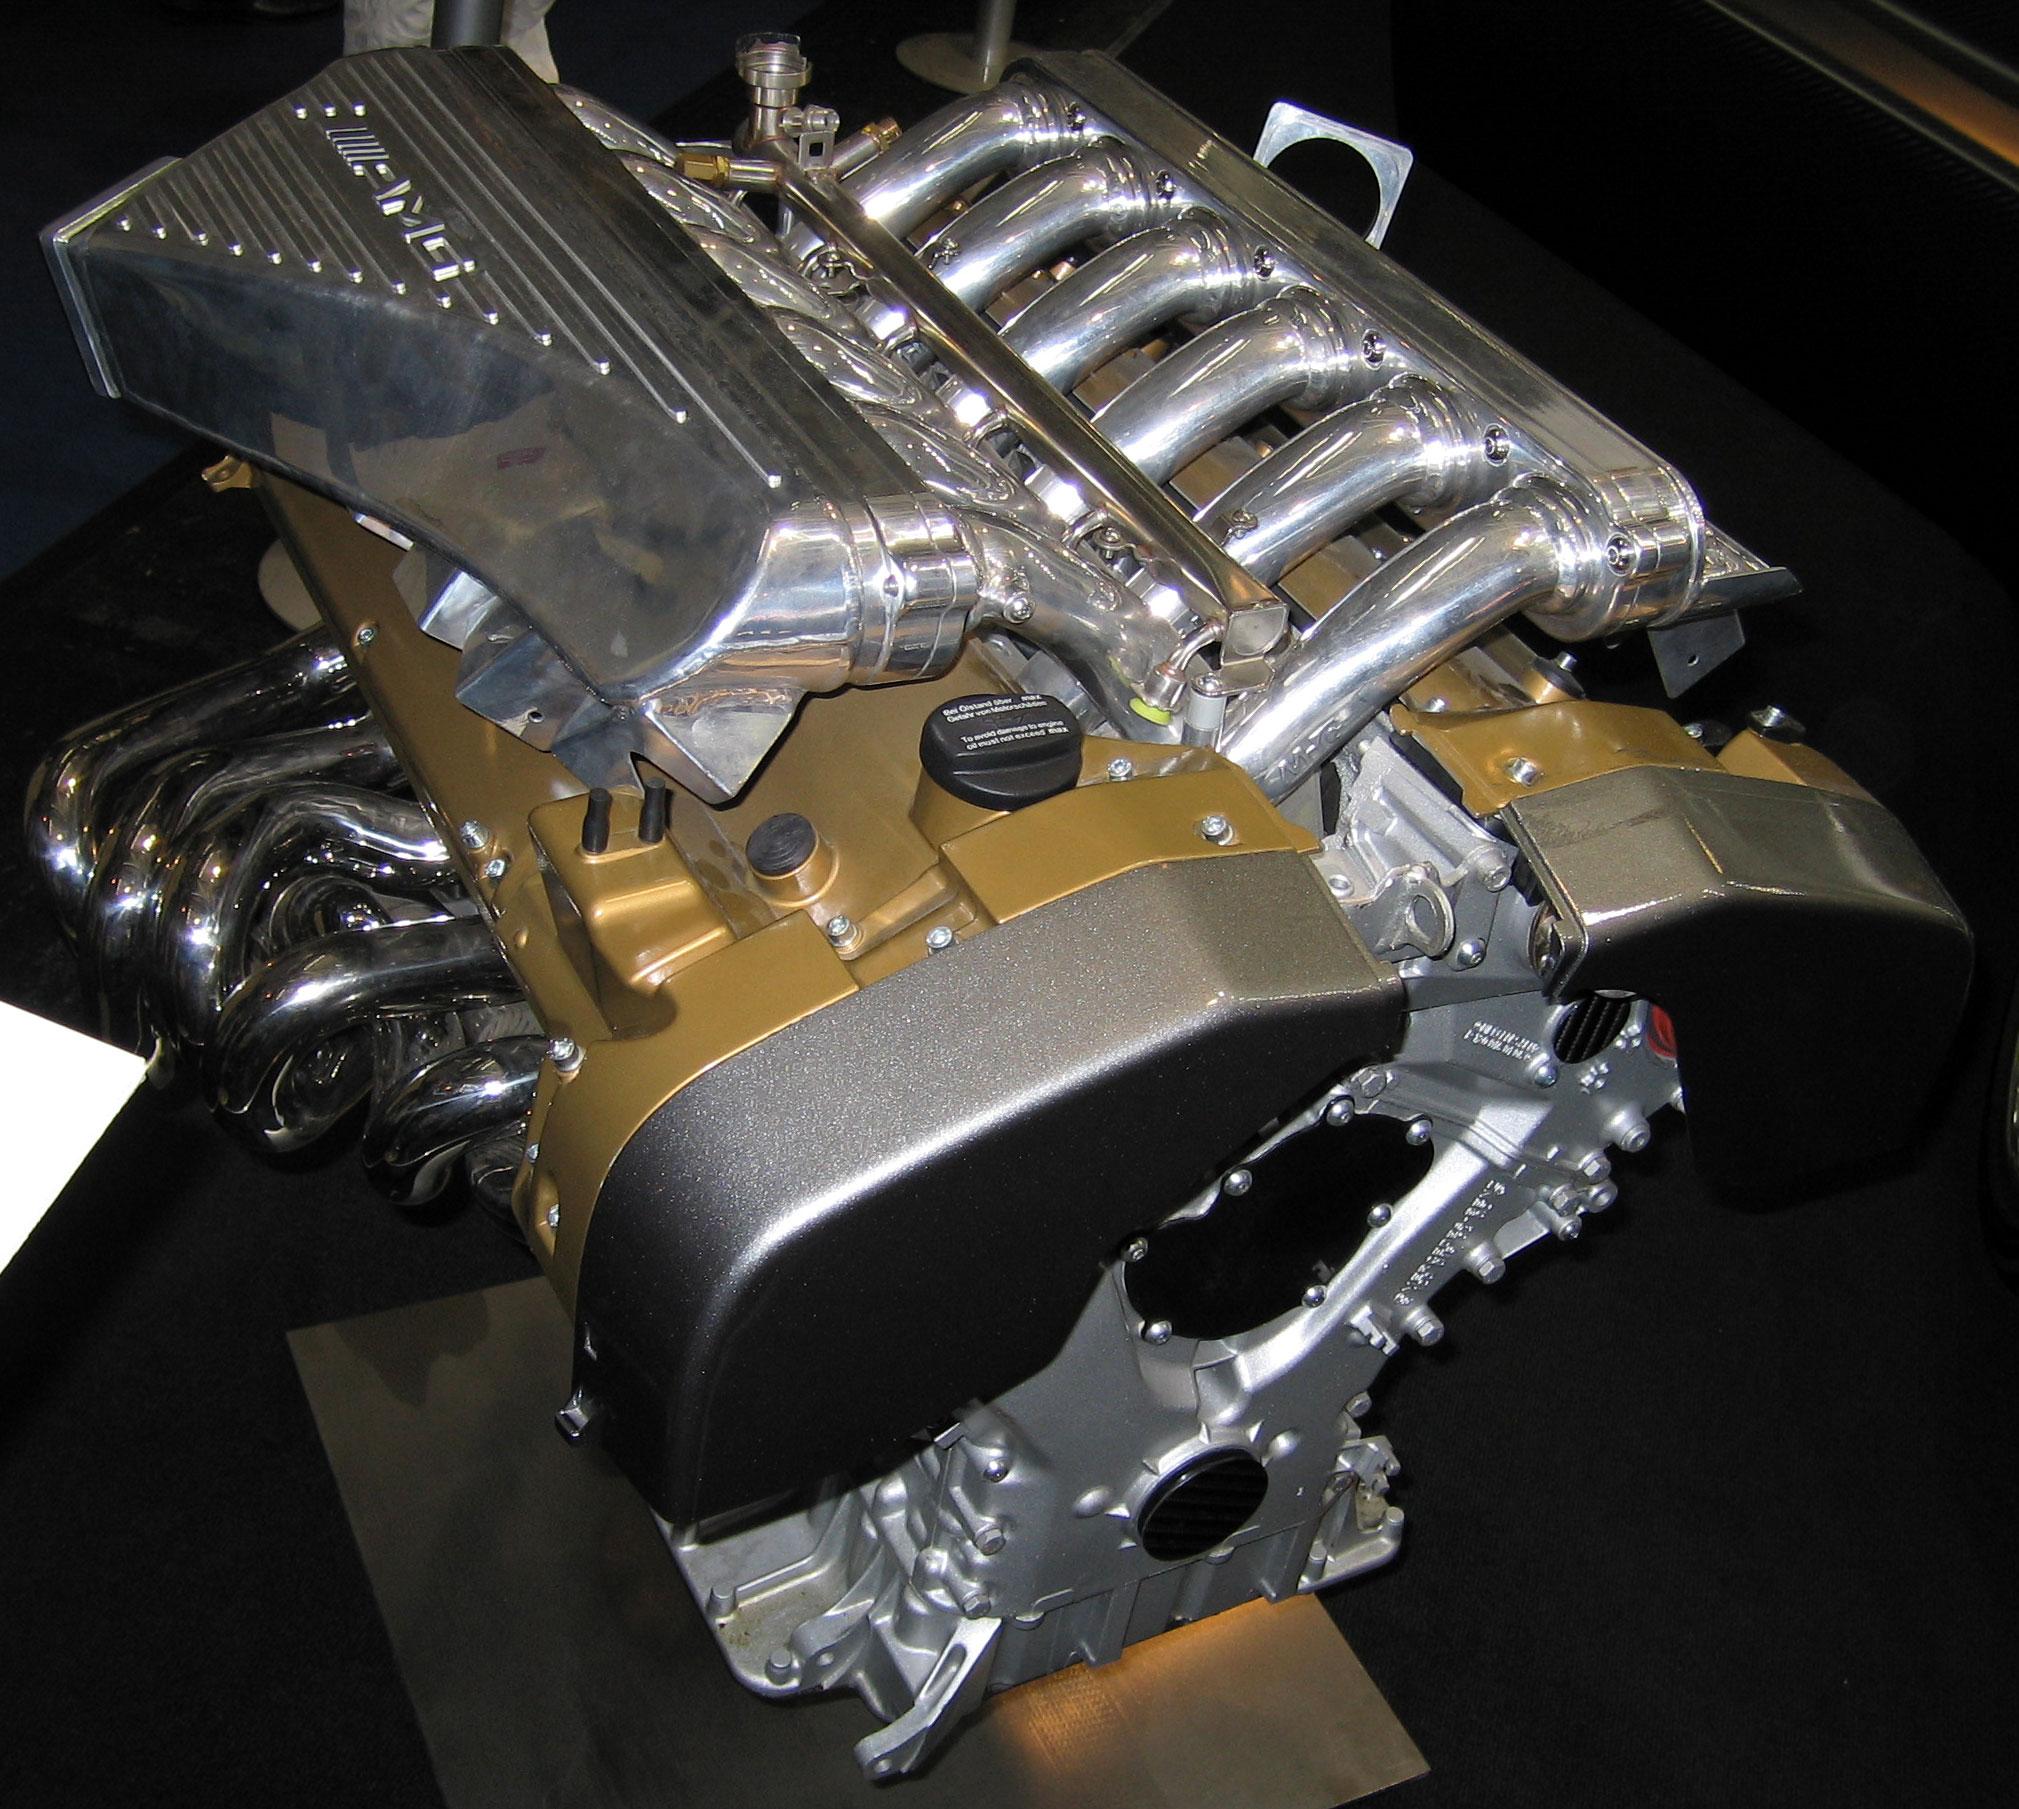 File:Pagani Zonda F engine (AMG V12 7 3l)2 jpg - Wikimedia